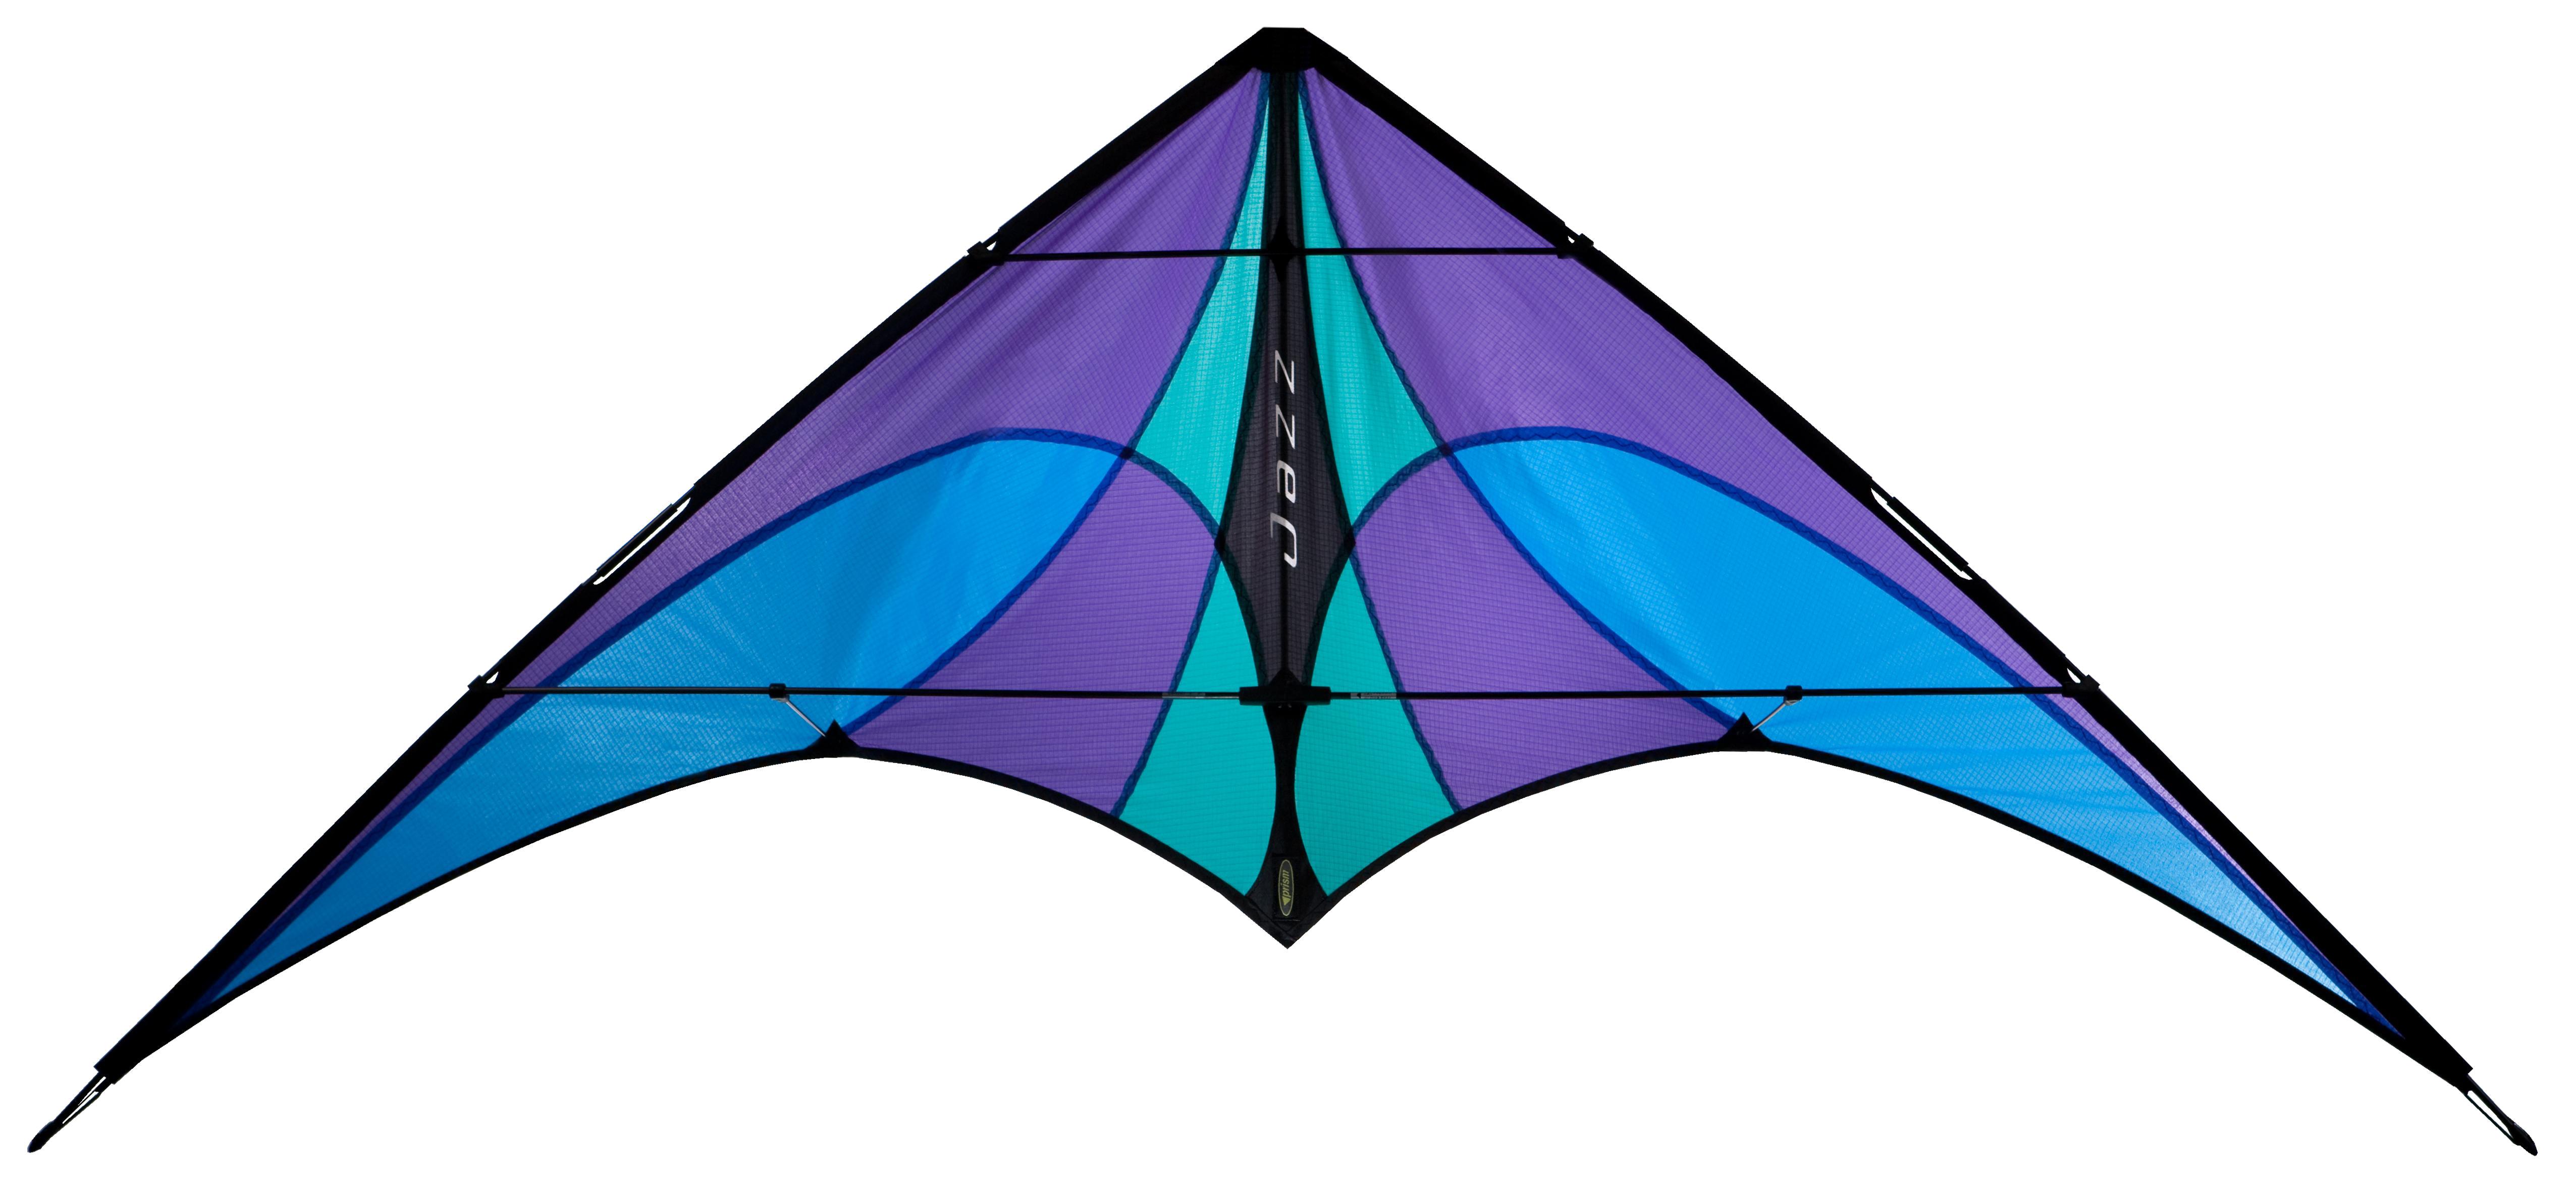 Prism jazz stunt ice. Kite clipart purple